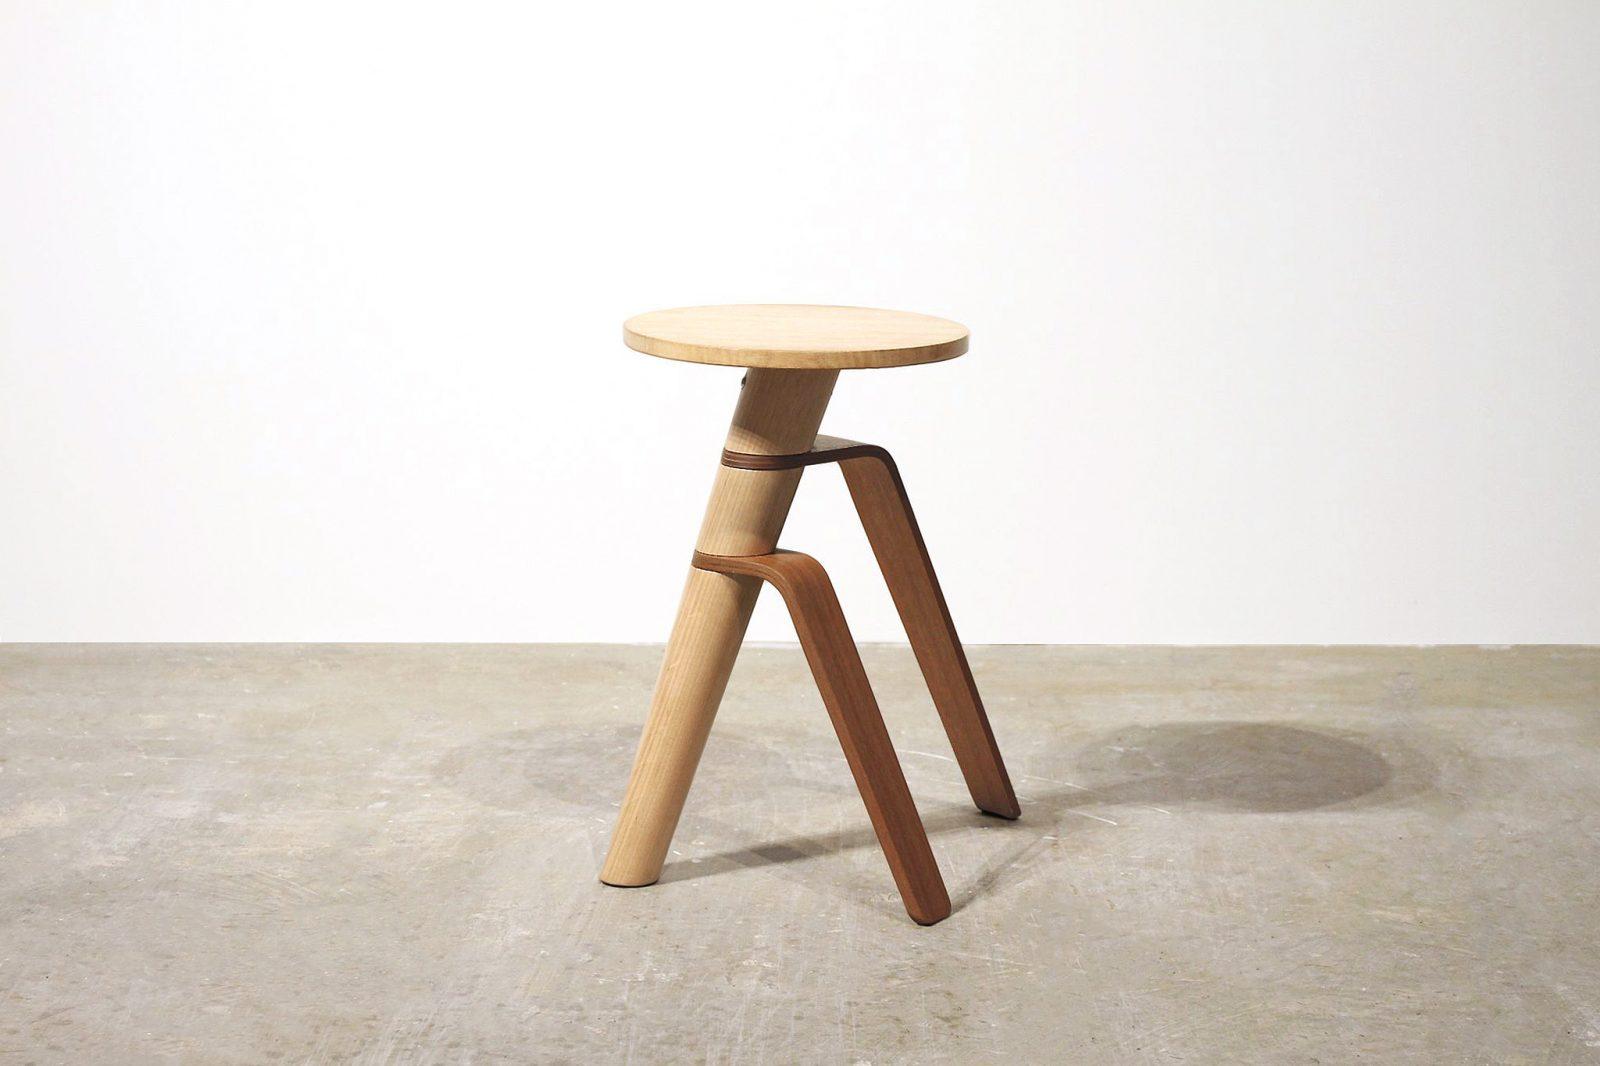 George Shvili, AWRY stool. Photo: Courtesy of the artist